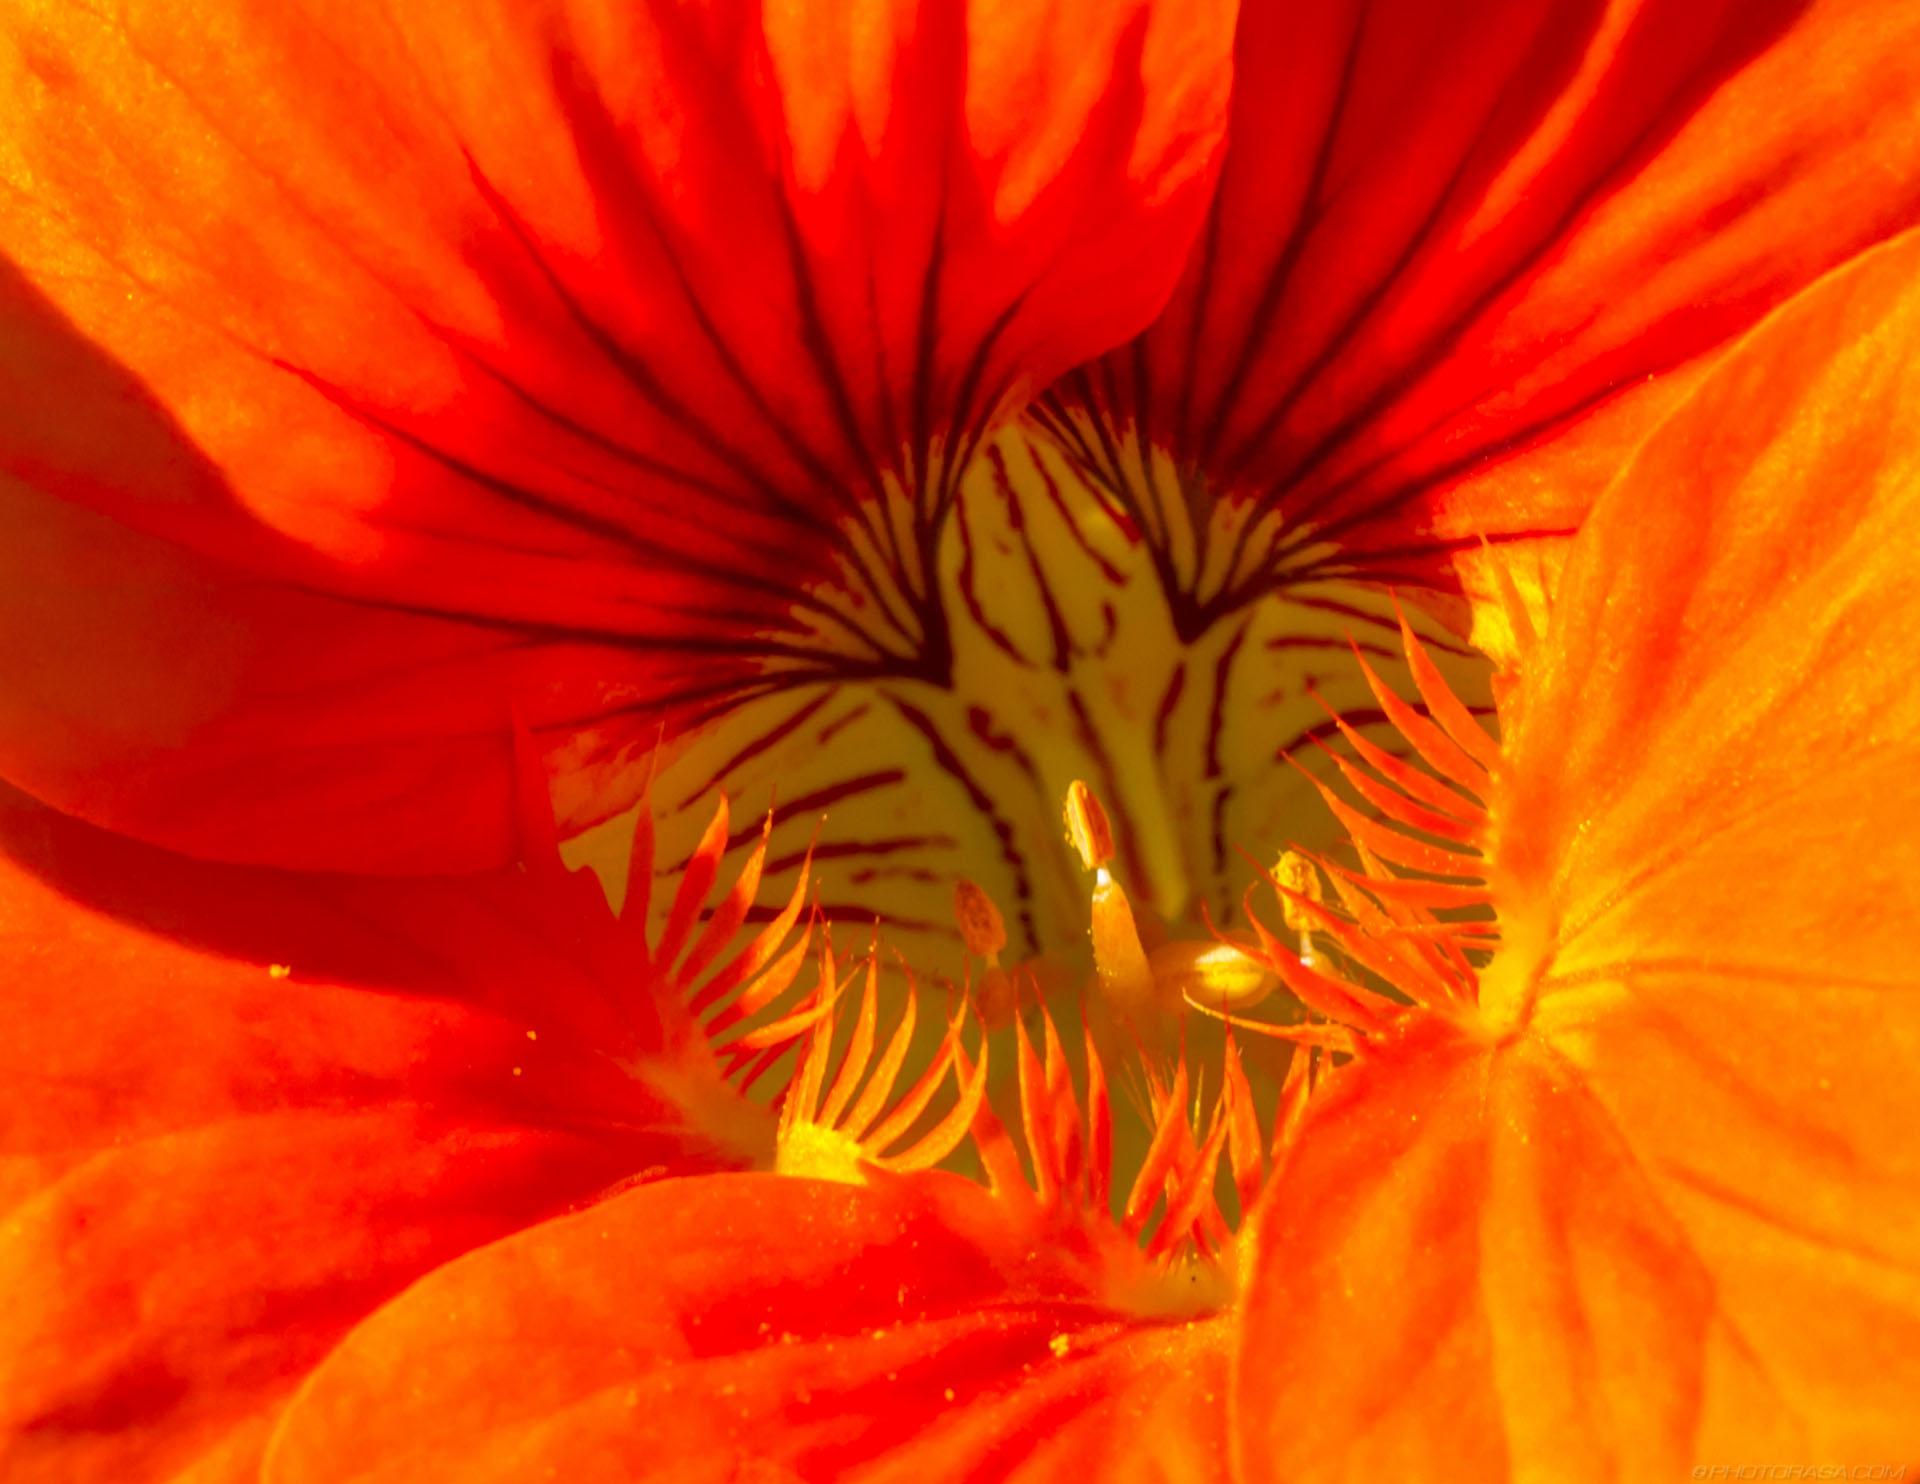 http://photorasa.com/nature/strange-exotic-flowers/attachment/orange-striped-stamen/